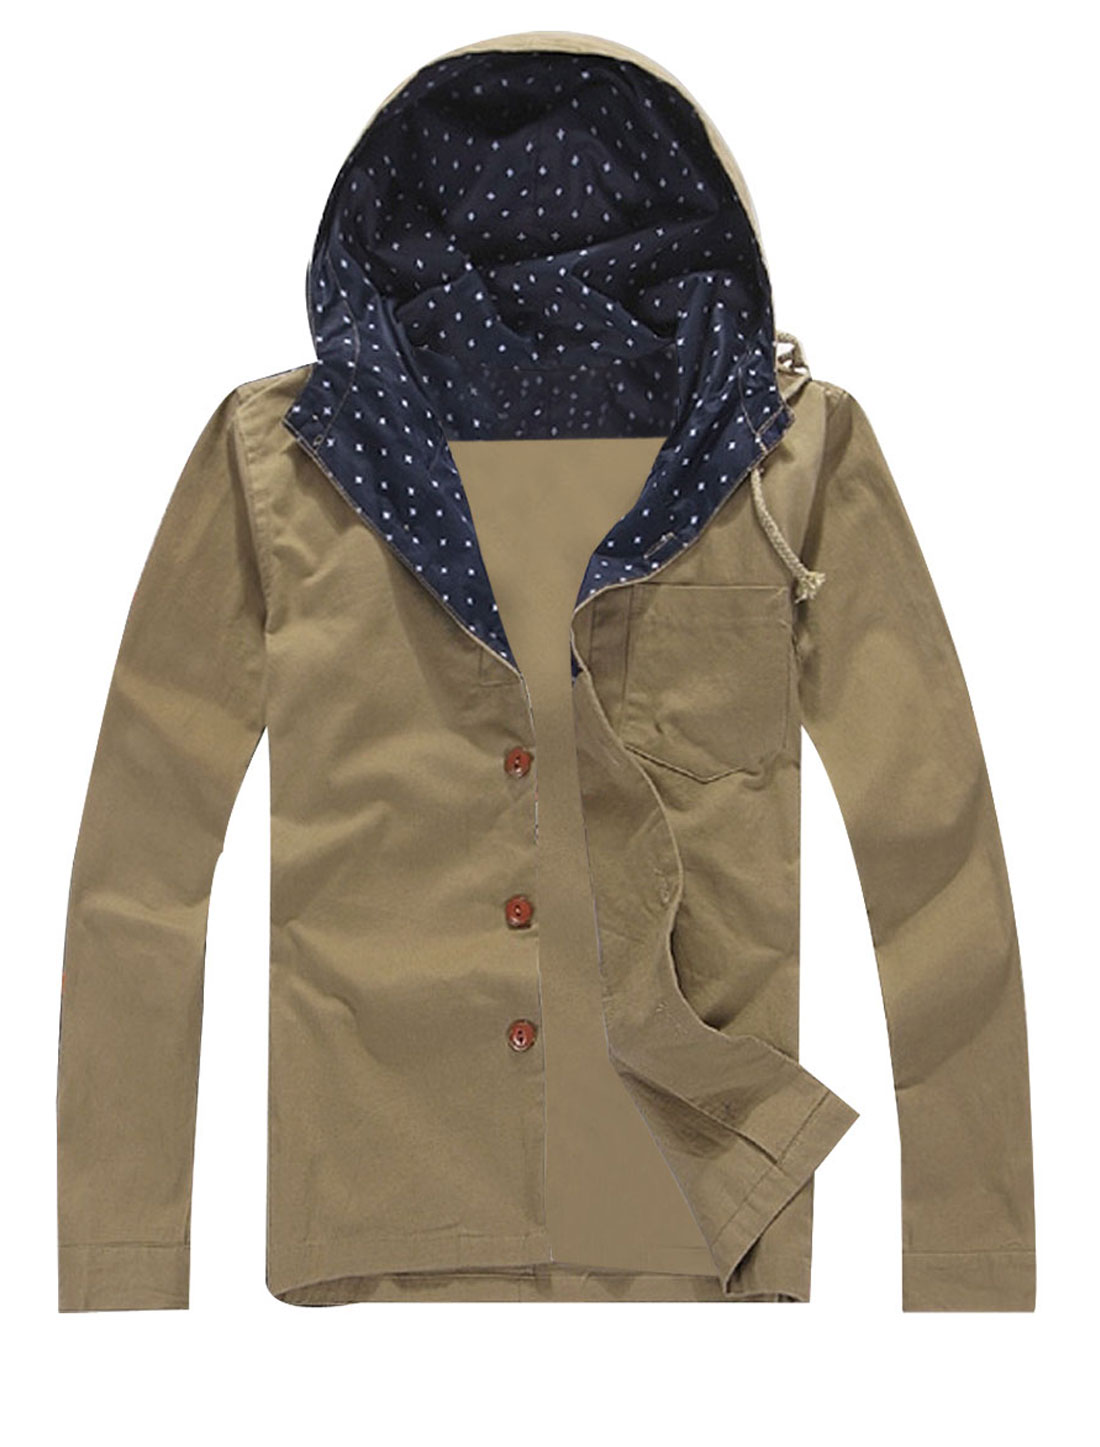 Mens Dark Khaki Color Stylish Button Down Wild Flowers Detail Autumn Hoodie M